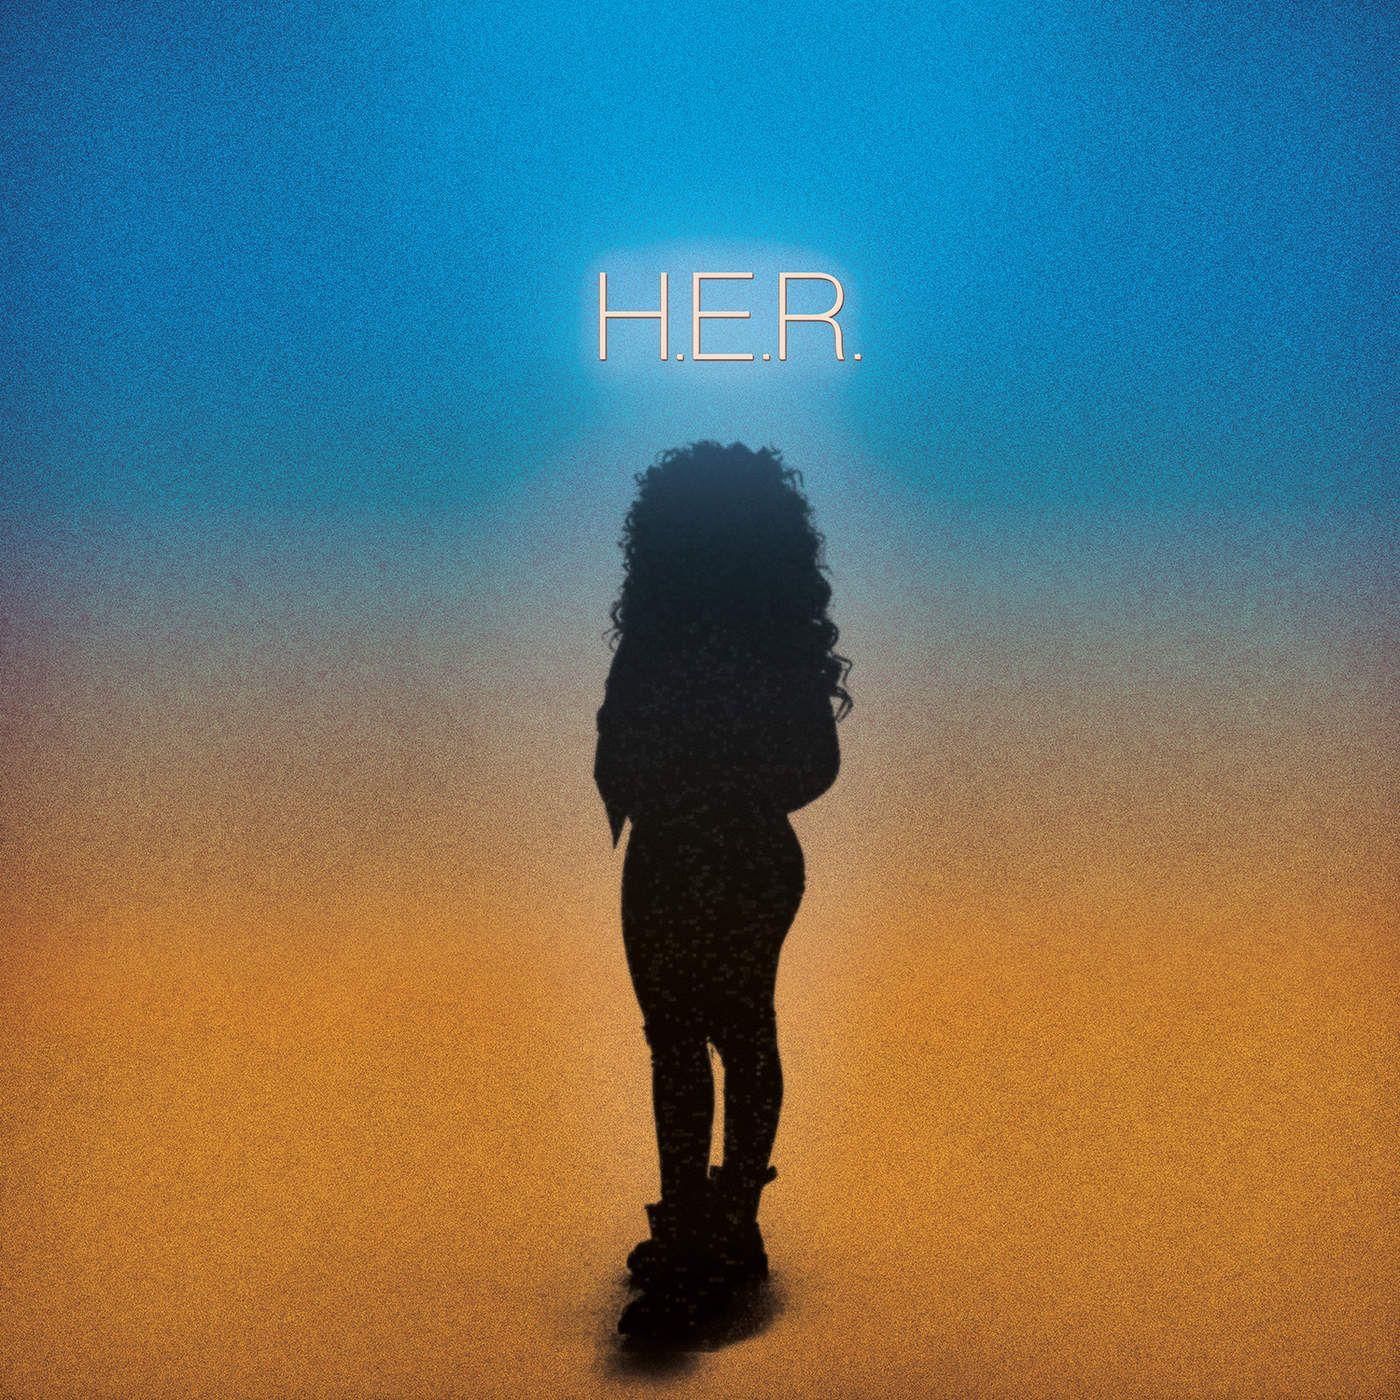 H.E.R. - H.e.r. album cover